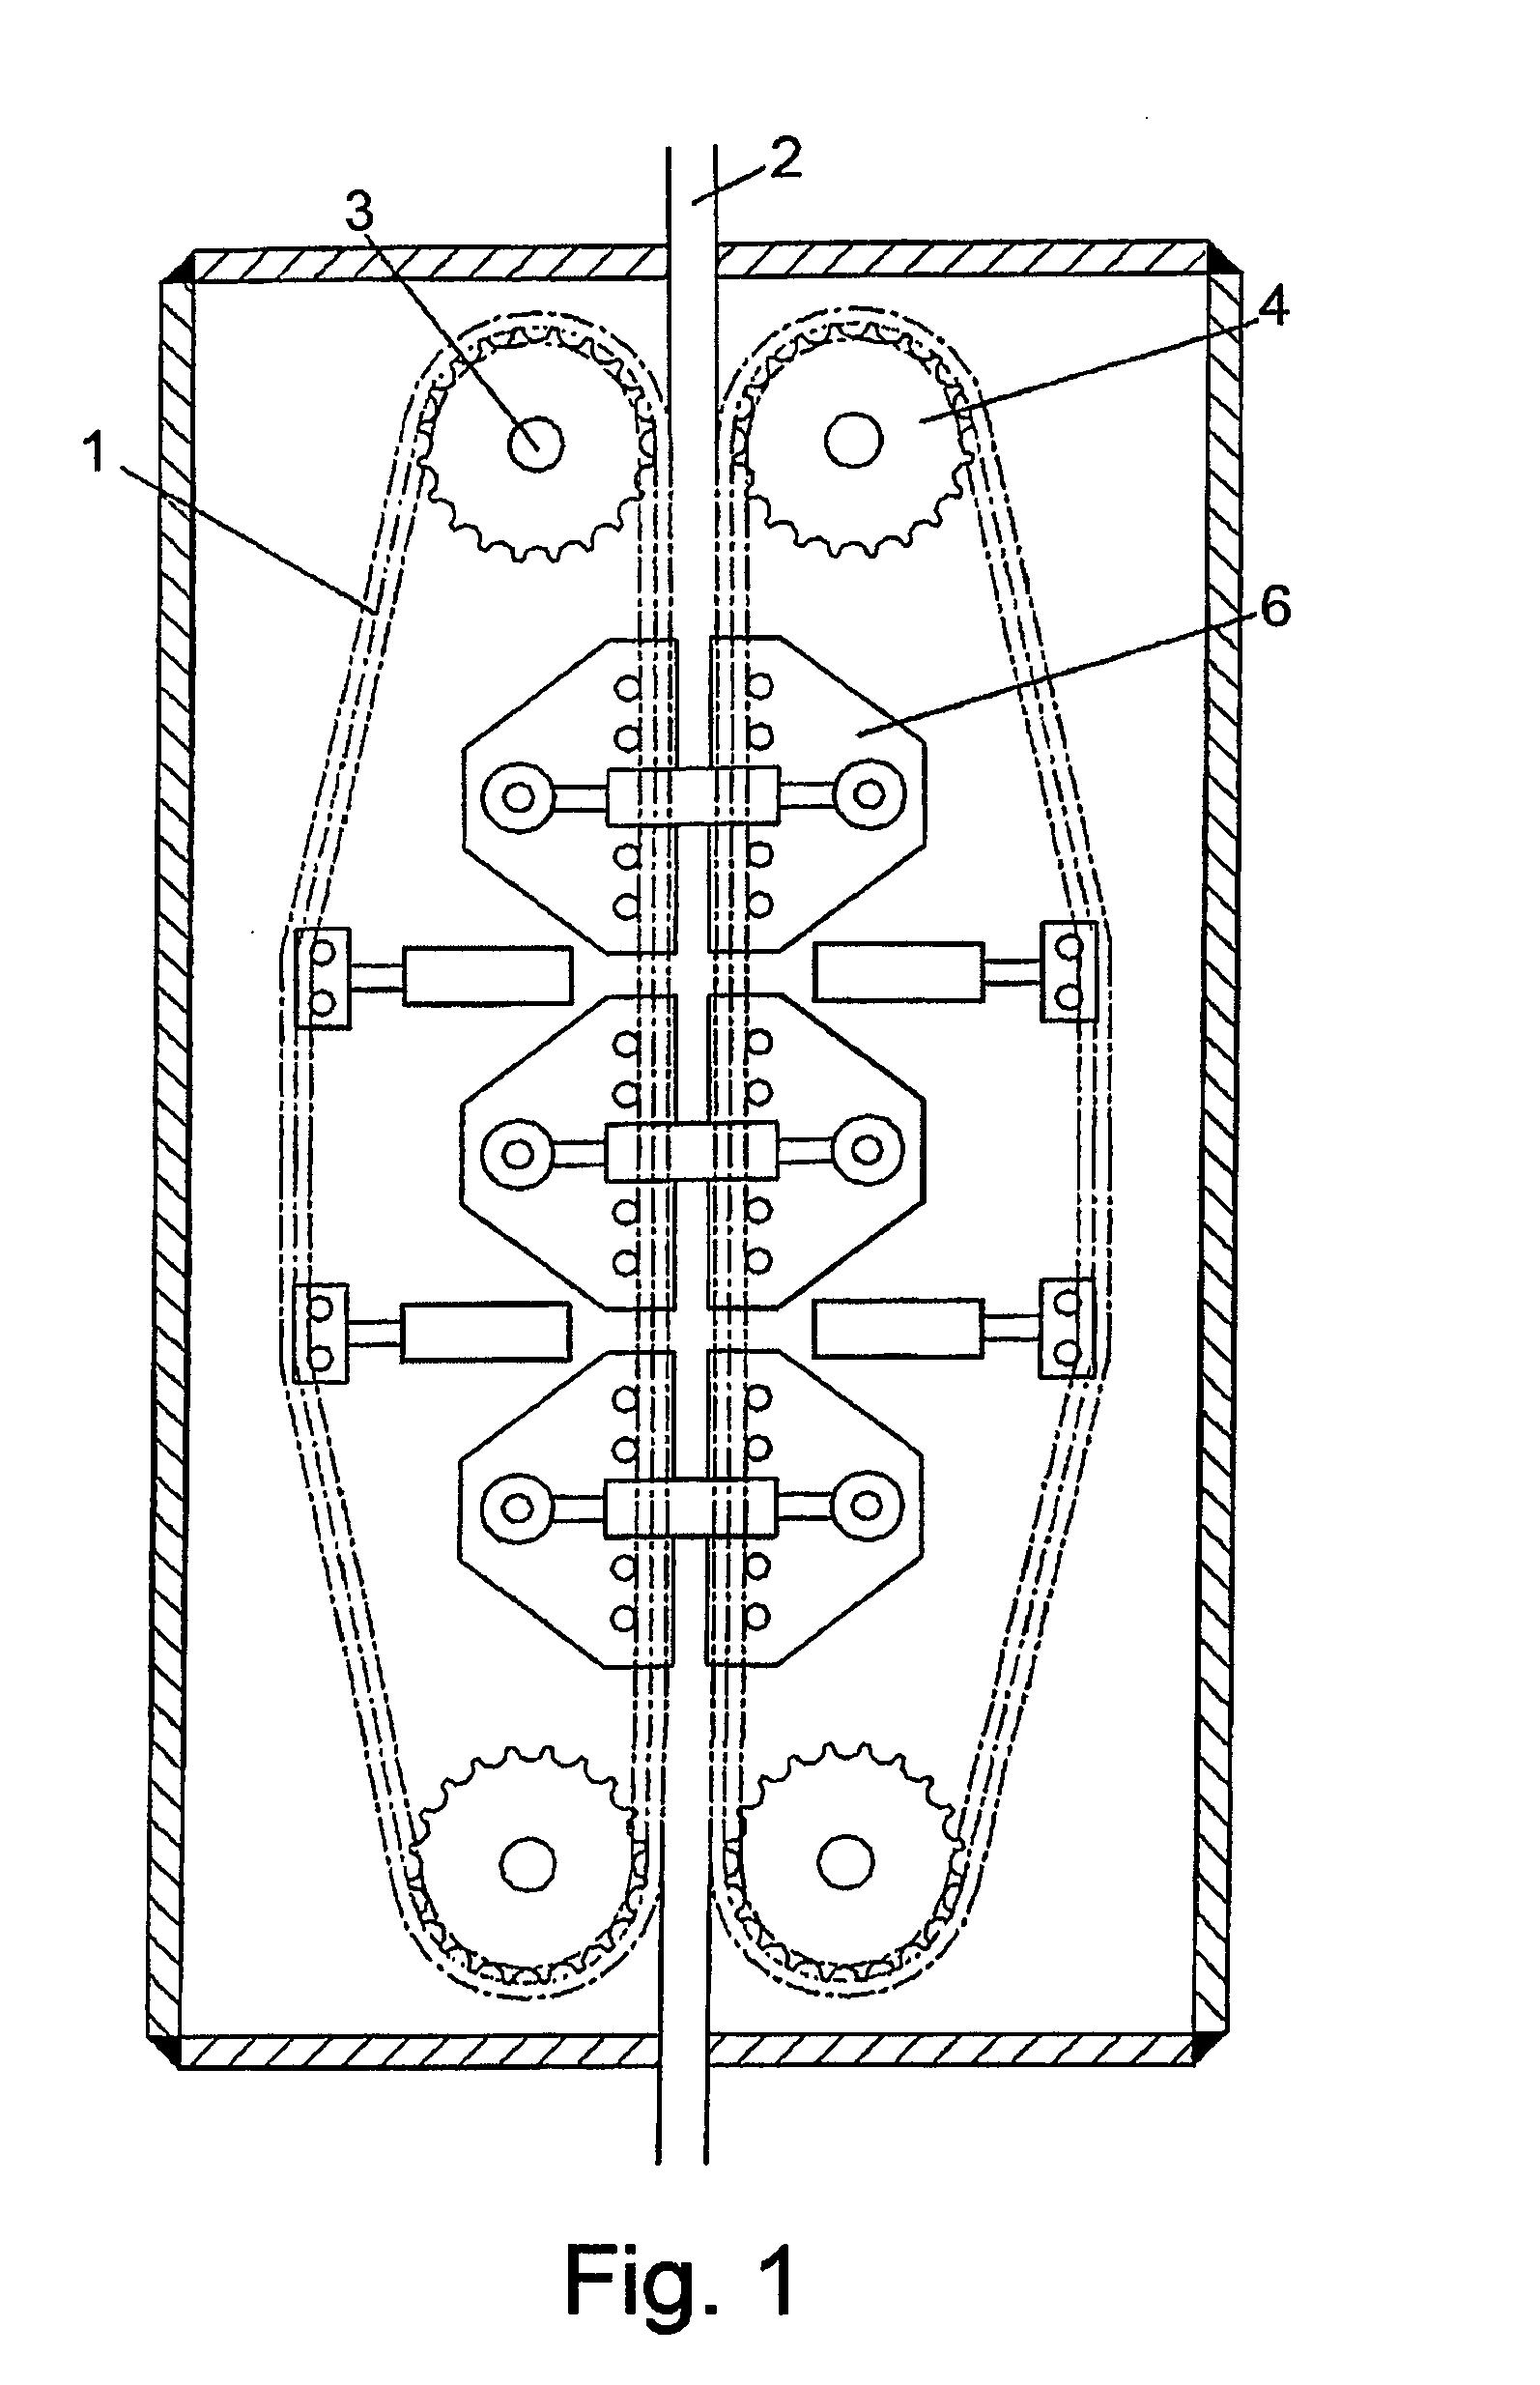 Coil Tubing Diagram Wiring Diagram